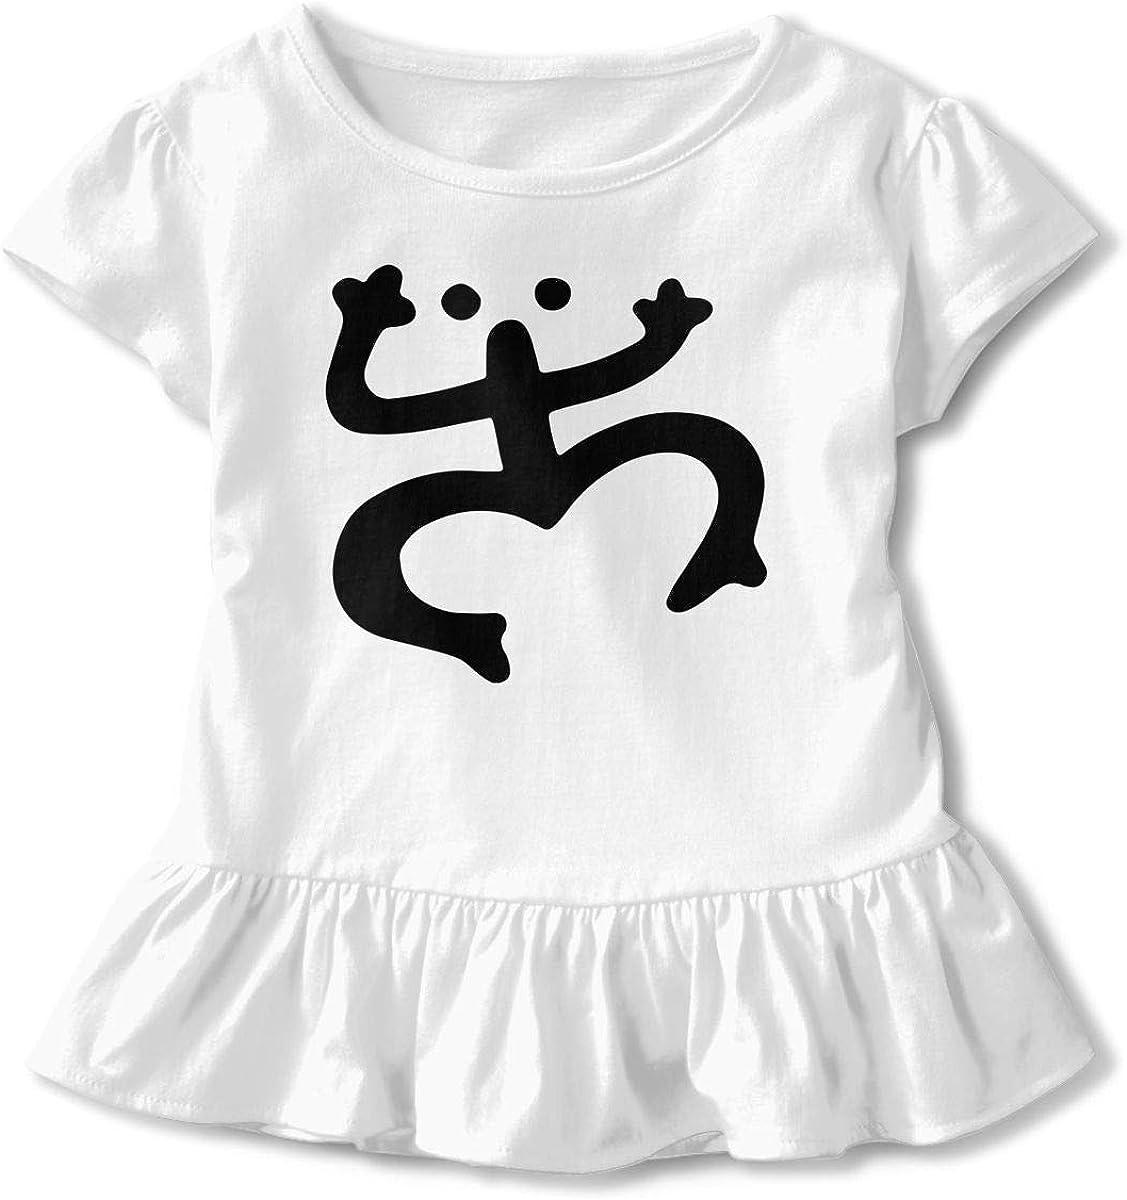 Puerto Rico Coqui Little Girls Short Sleeve Cotton Tee Tops